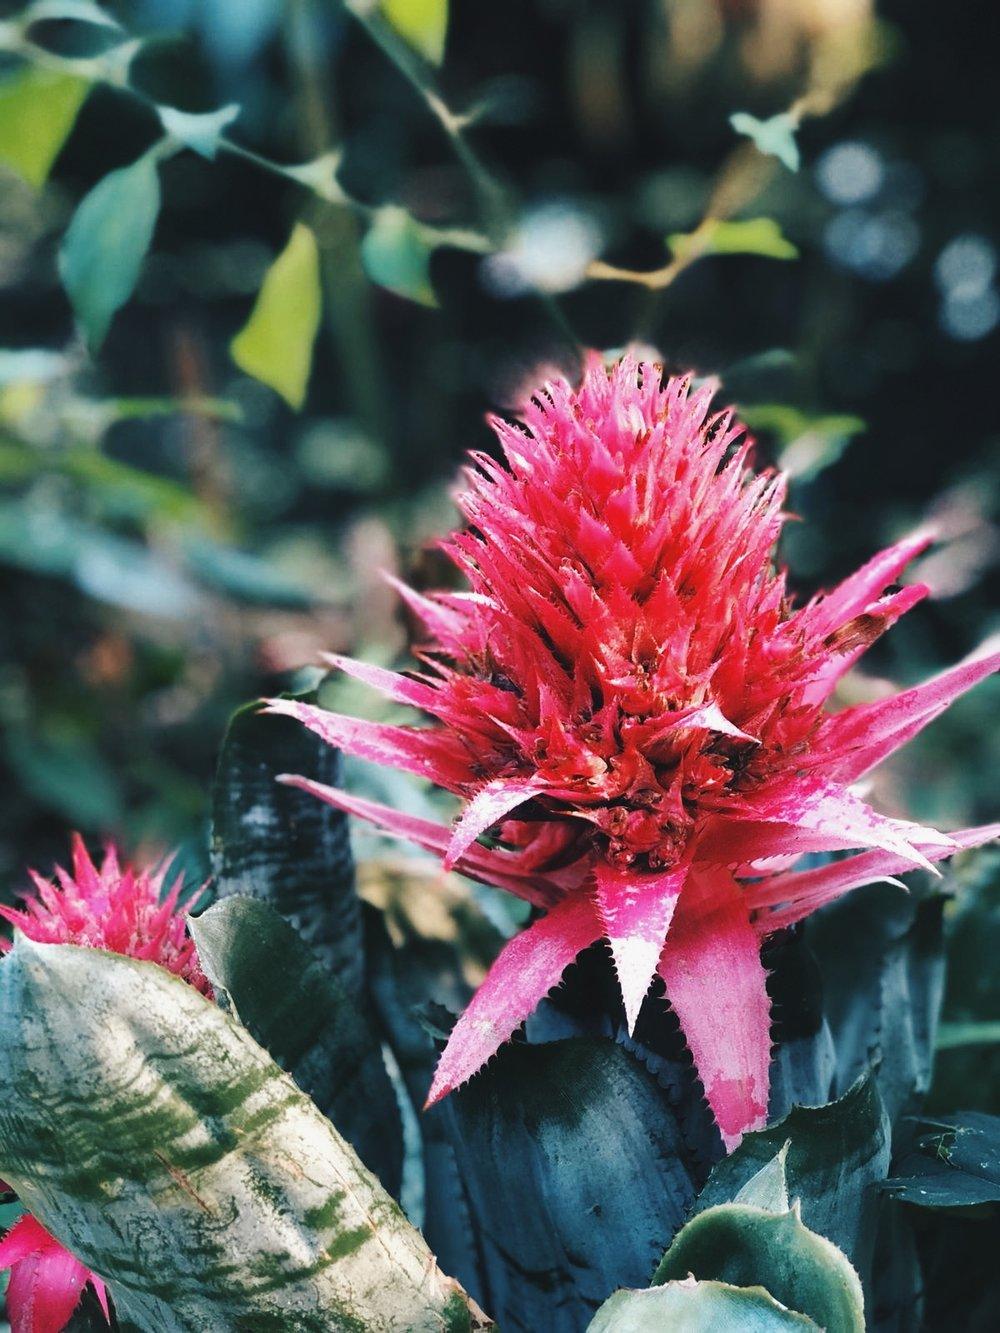 Pics from The Botanics